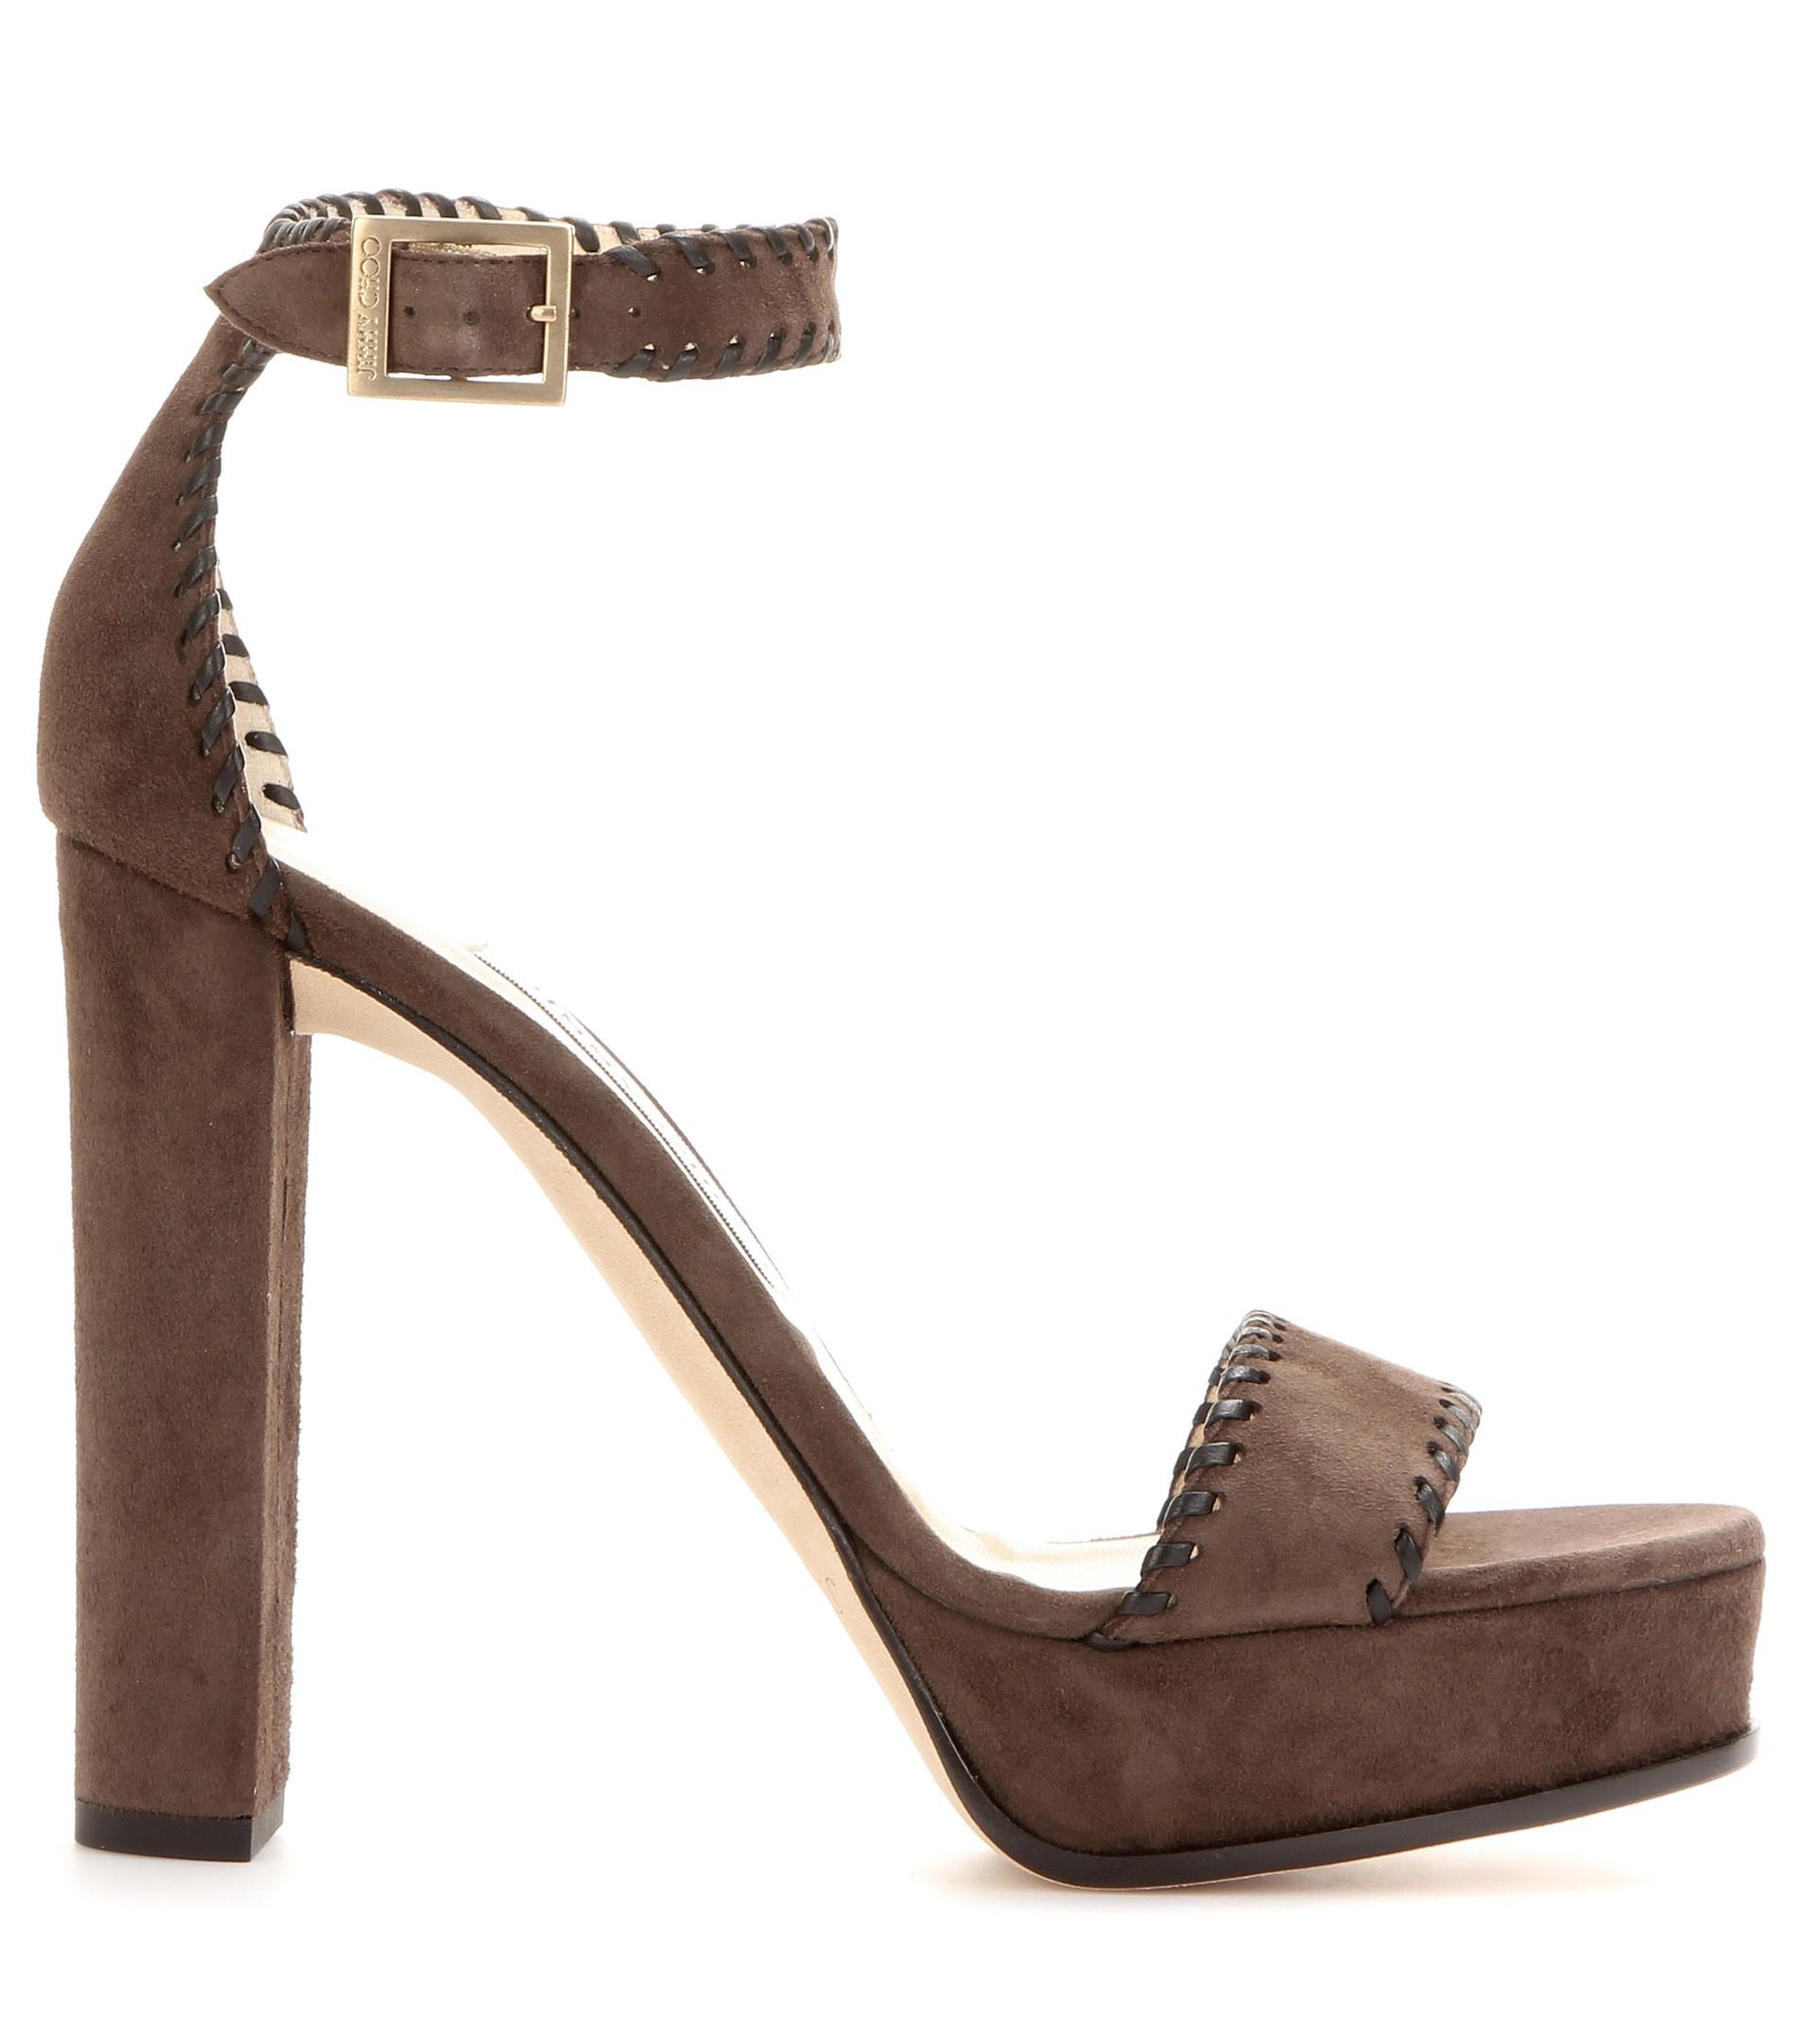 344dd969220 ... switzerland jimmy choo mira 80mm leather crisscross sandal in brown lyst  8f7b6 4c786